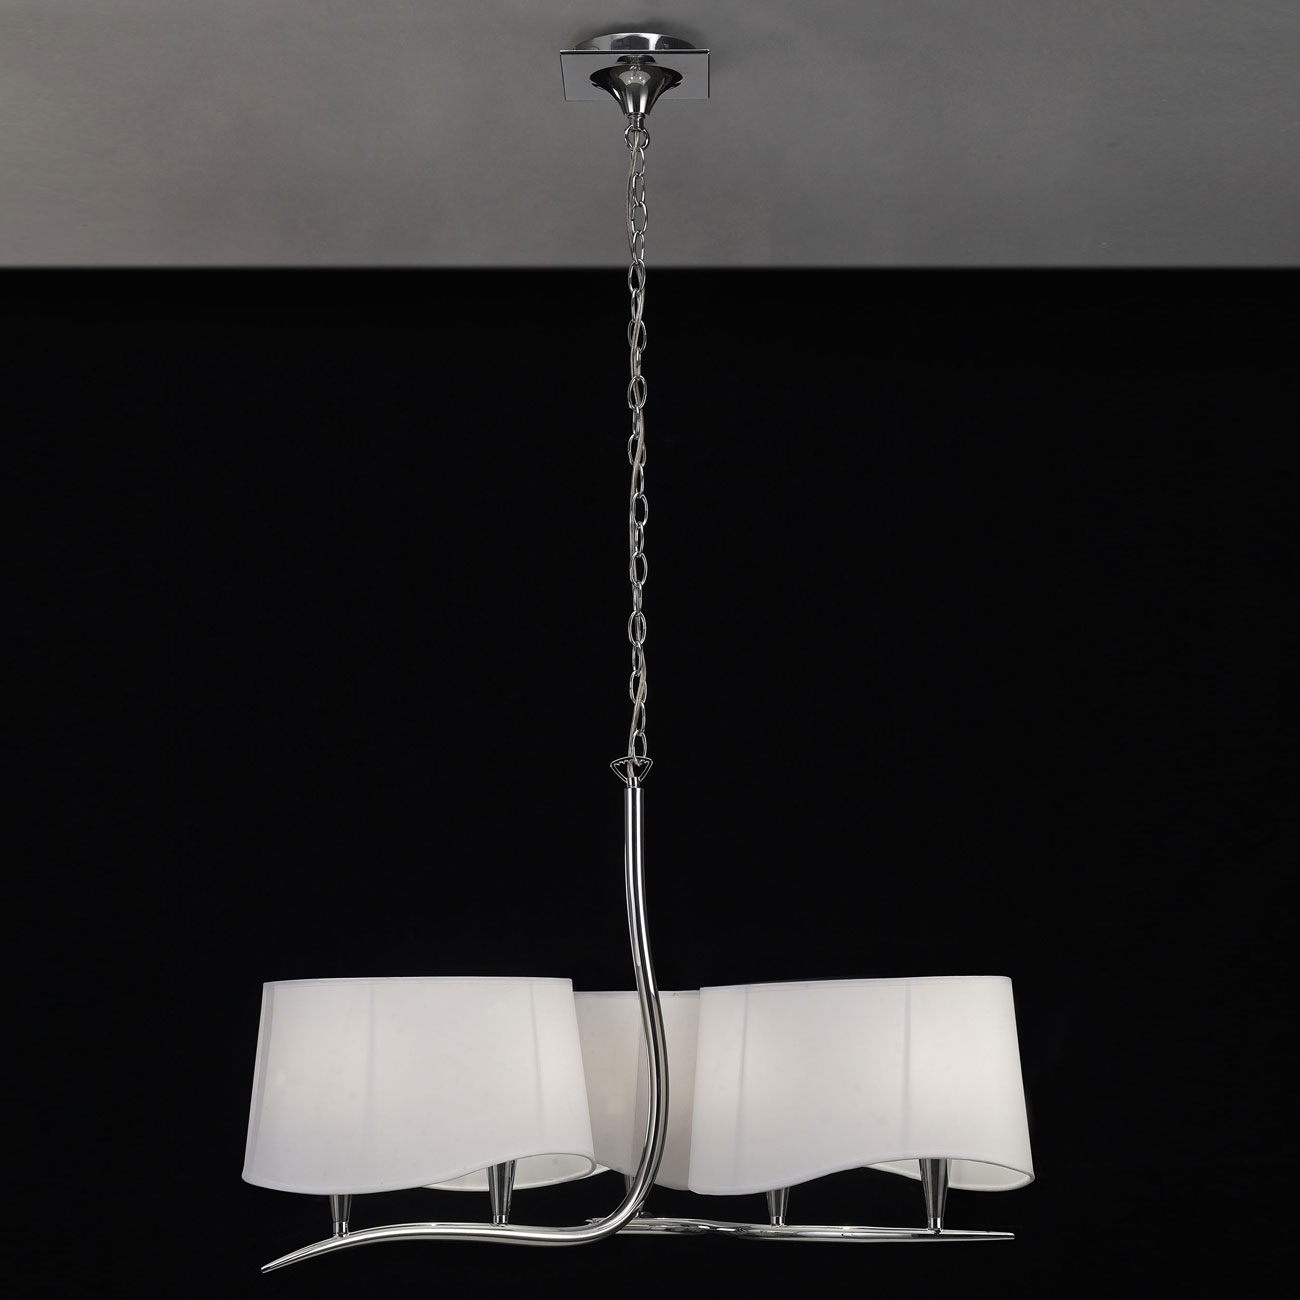 Ninette Pendant Lamp 6xE14 20w Chrome white lampshade